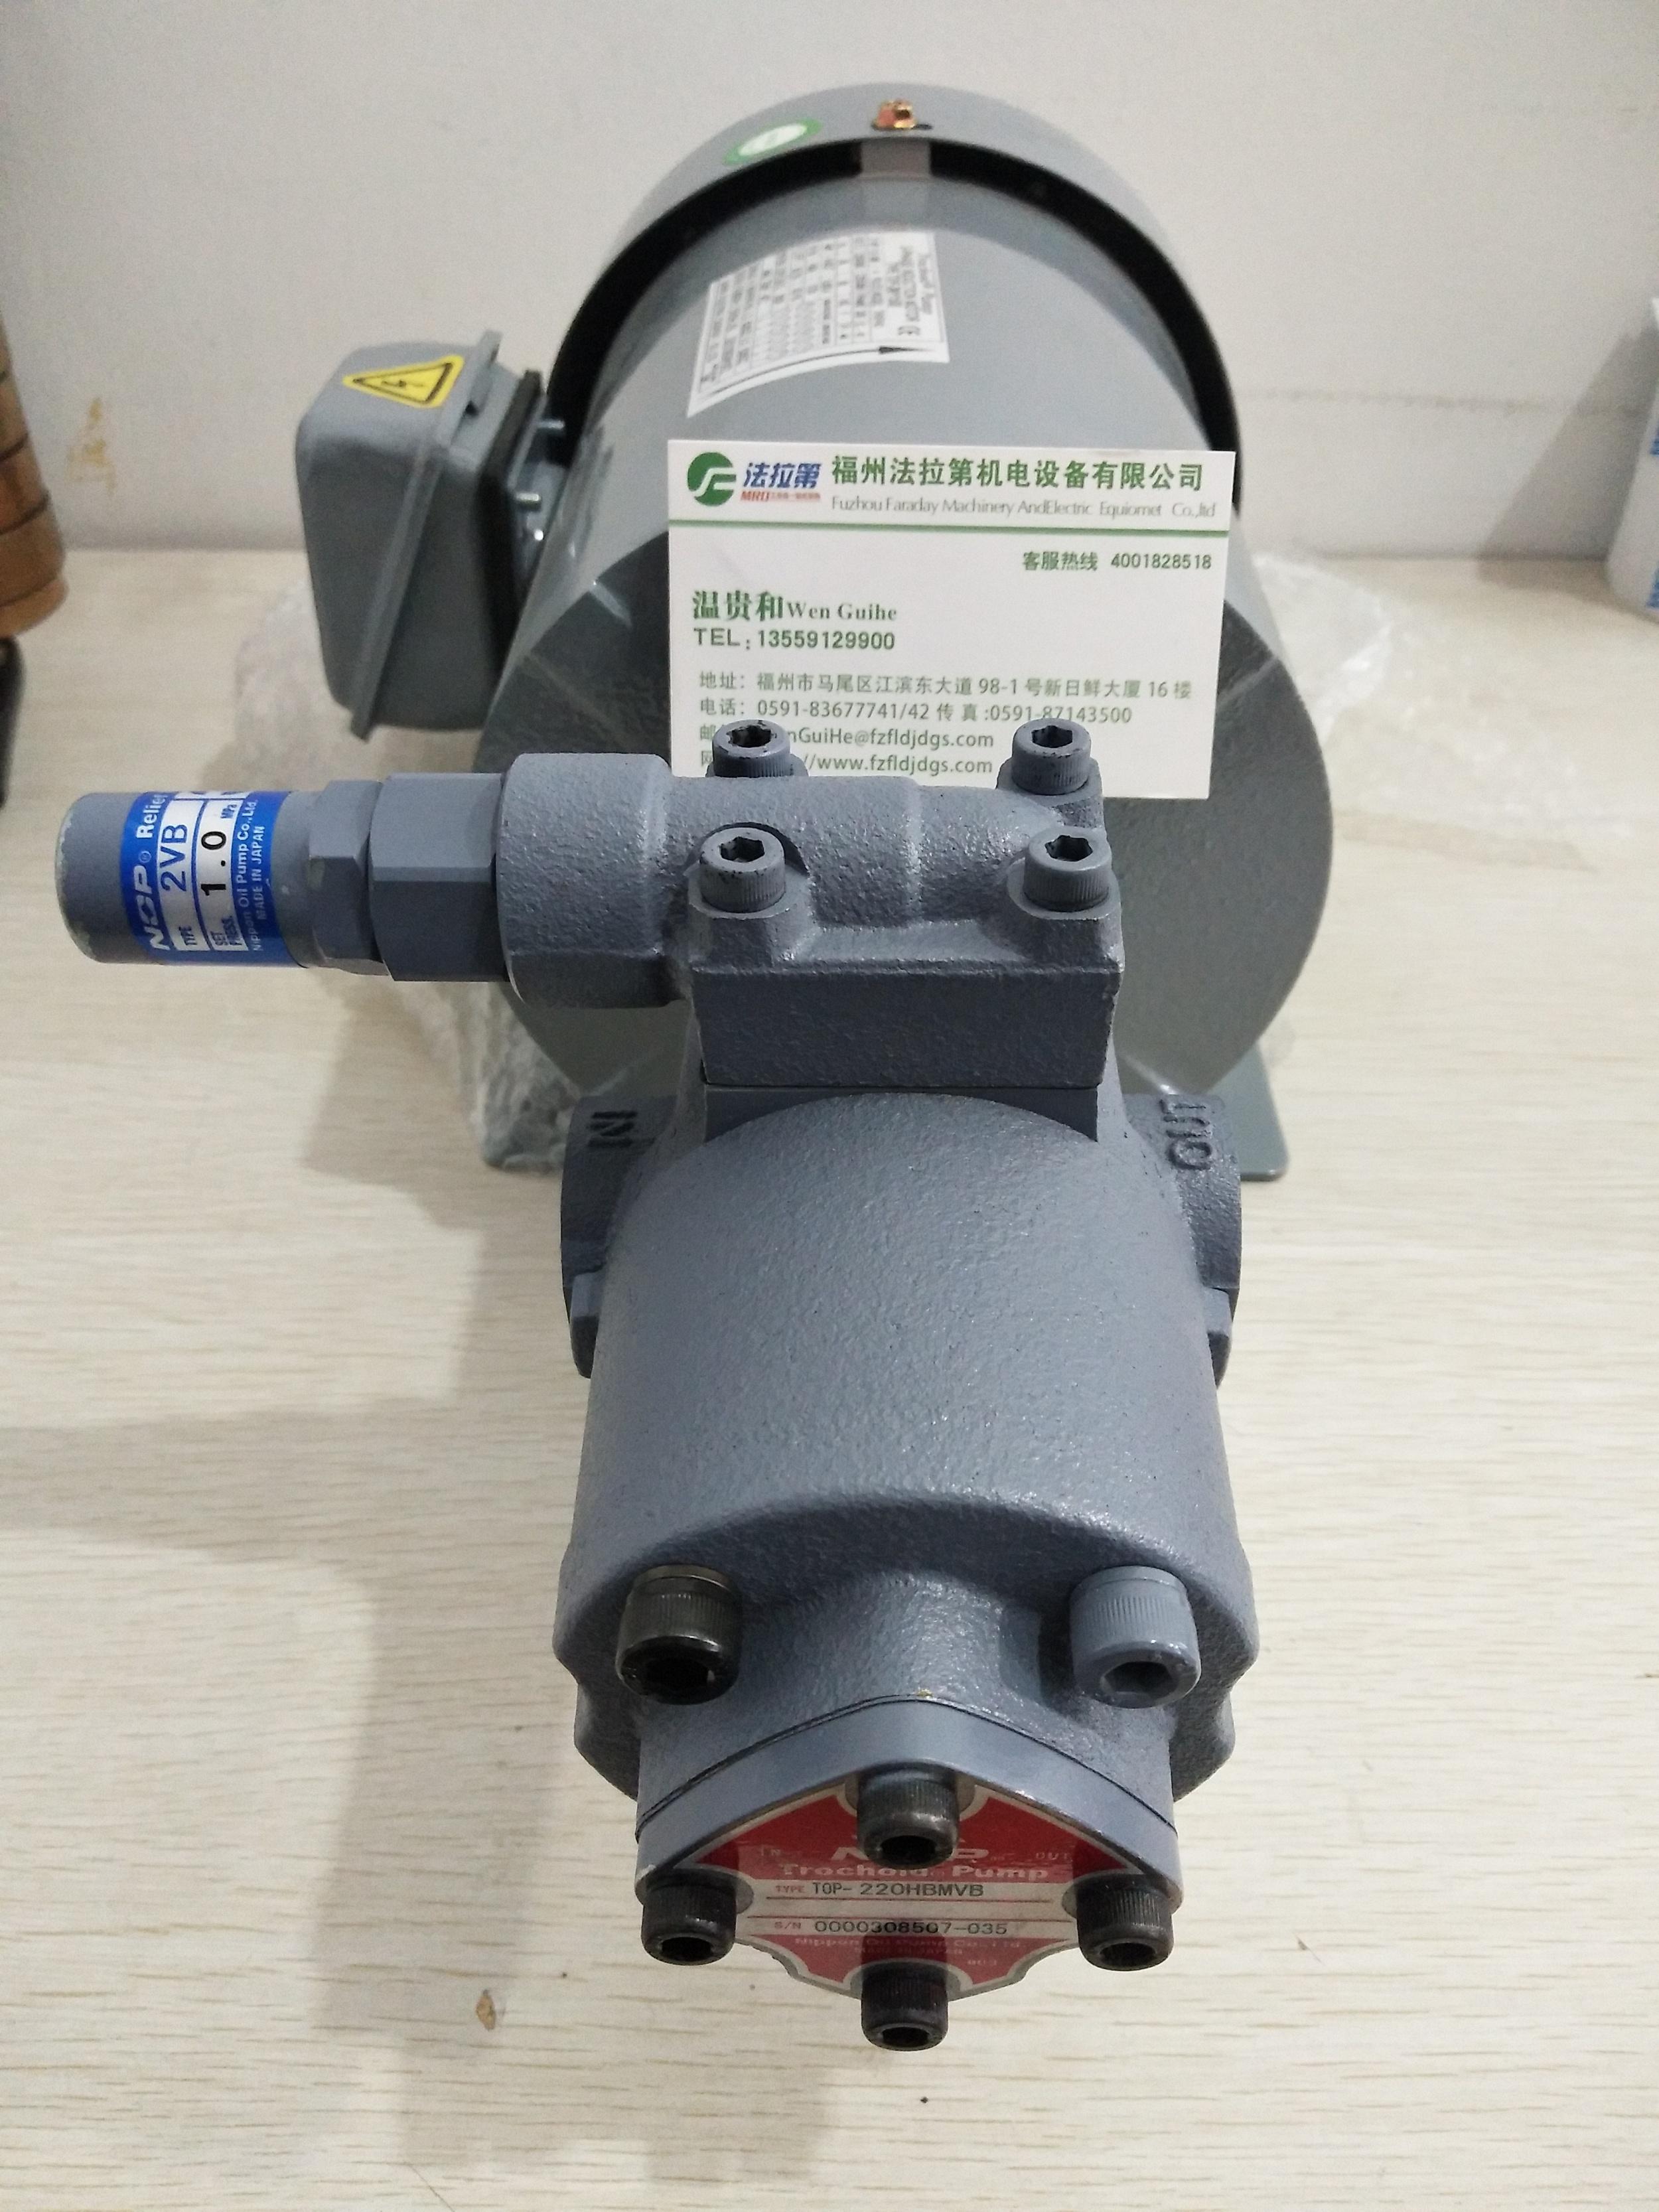 NOP油泵TOP-2MY1500-220HBMVB-3L 2021年4月上旬到货